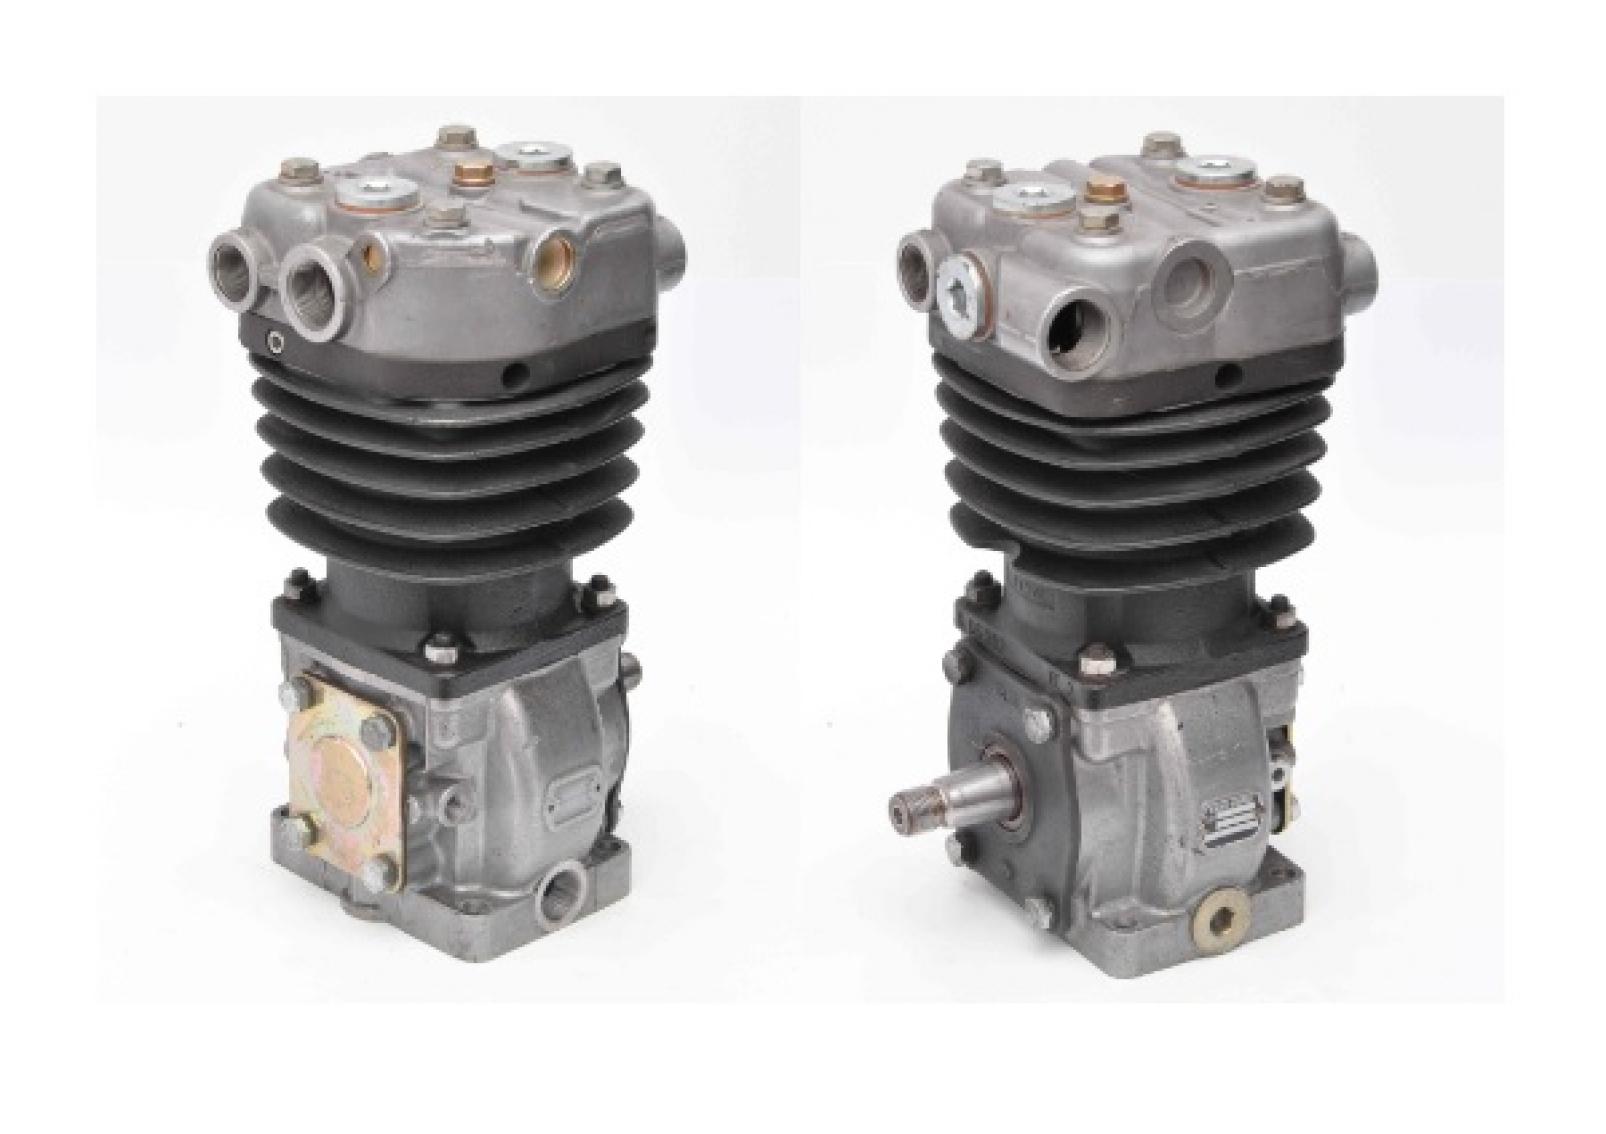 Air Compressor for Ikarus,  LP3940, 3761317401, 3761310101, 81541016053, 1114385, II14385